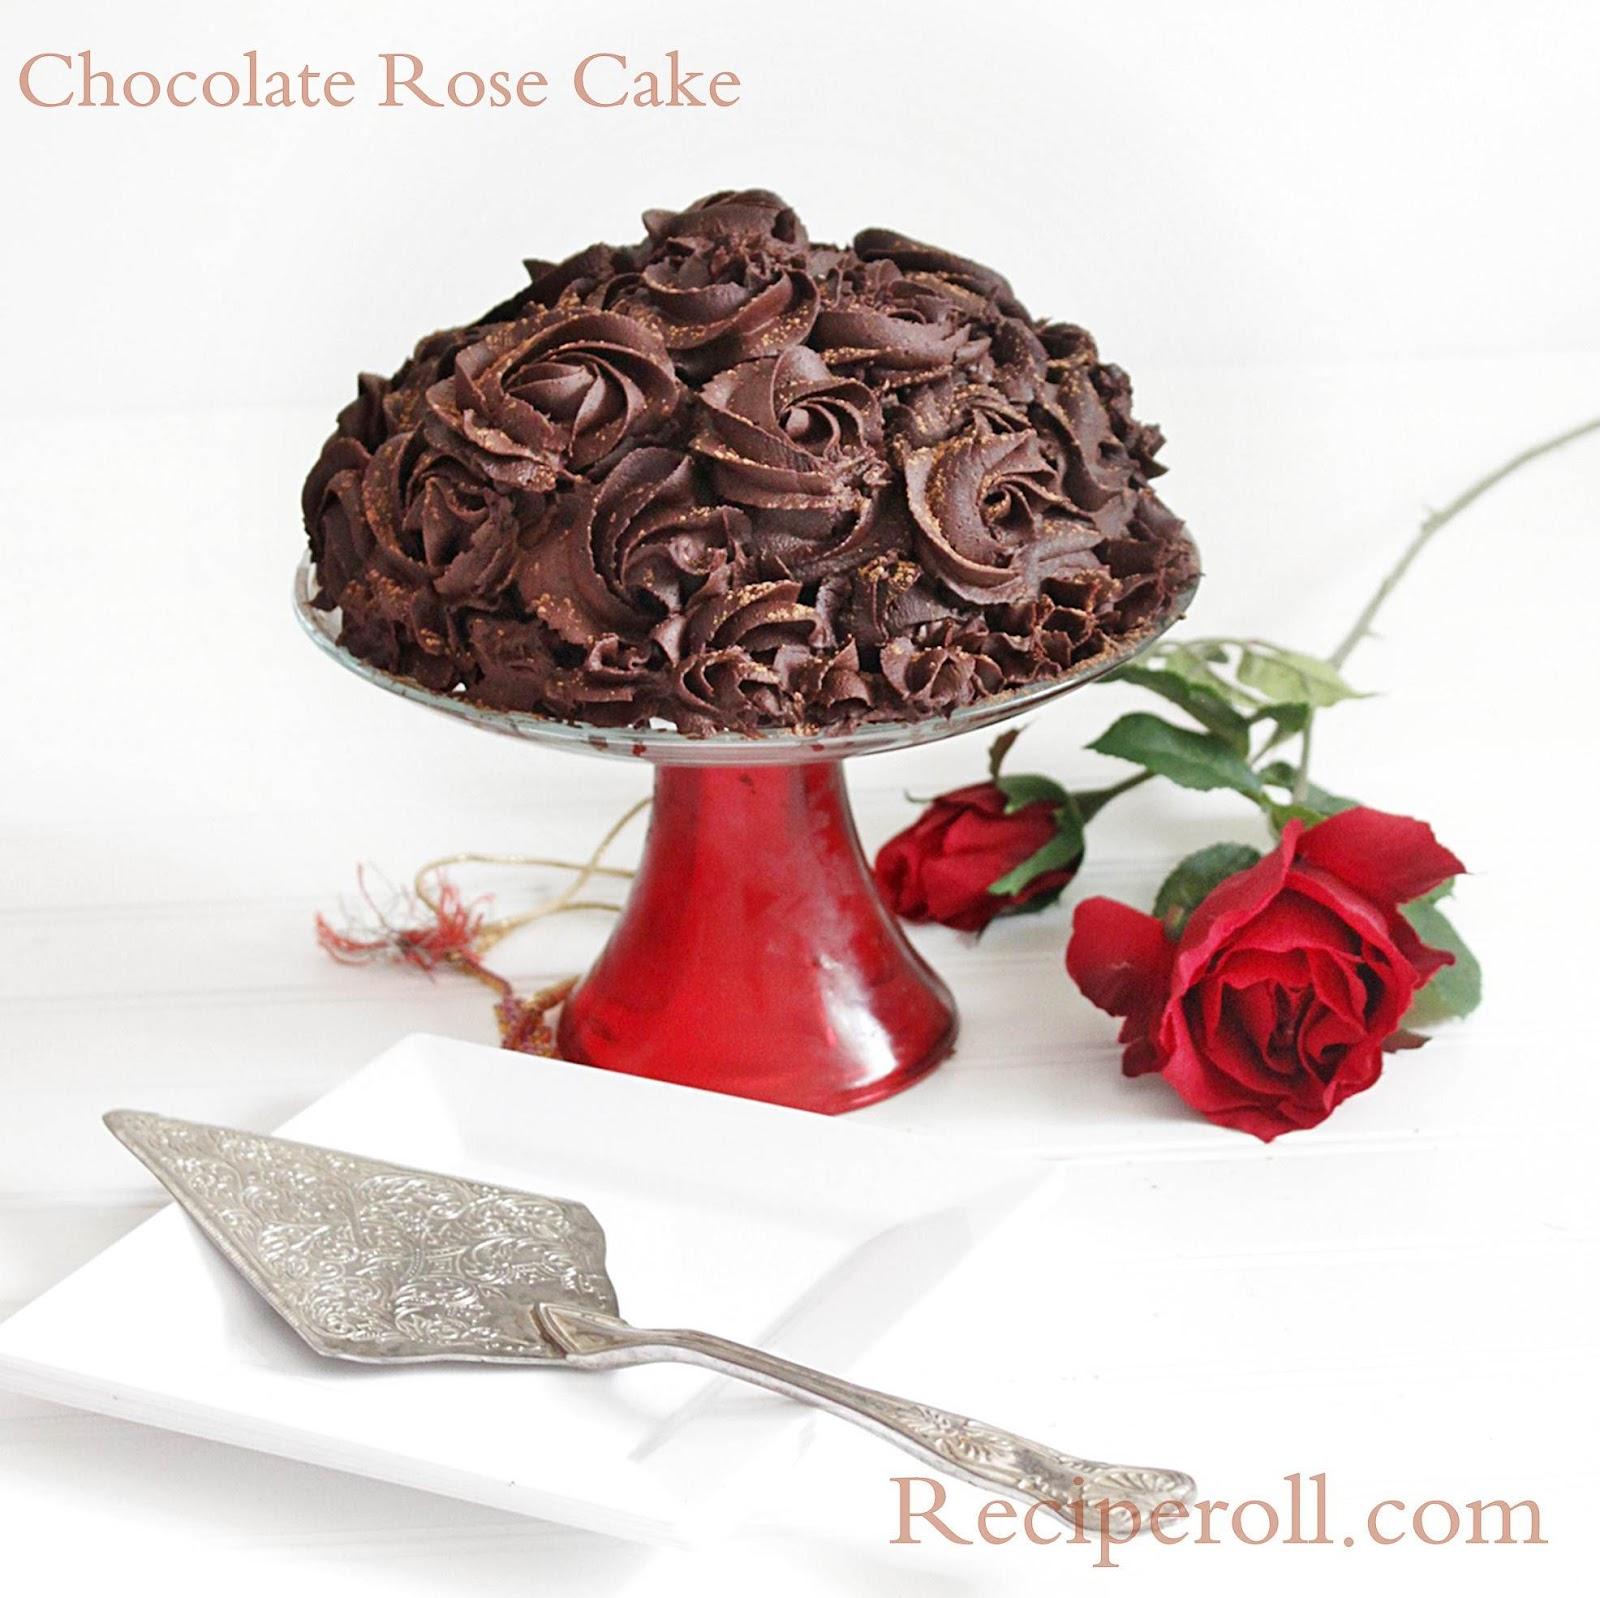 http://3.bp.blogspot.com/-9pI_5xQM5KY/UBLl4q9cp5I/AAAAAAAADag/yIsjXllTScU/s1600/chocolate%2Brose%2Bcake.JPG